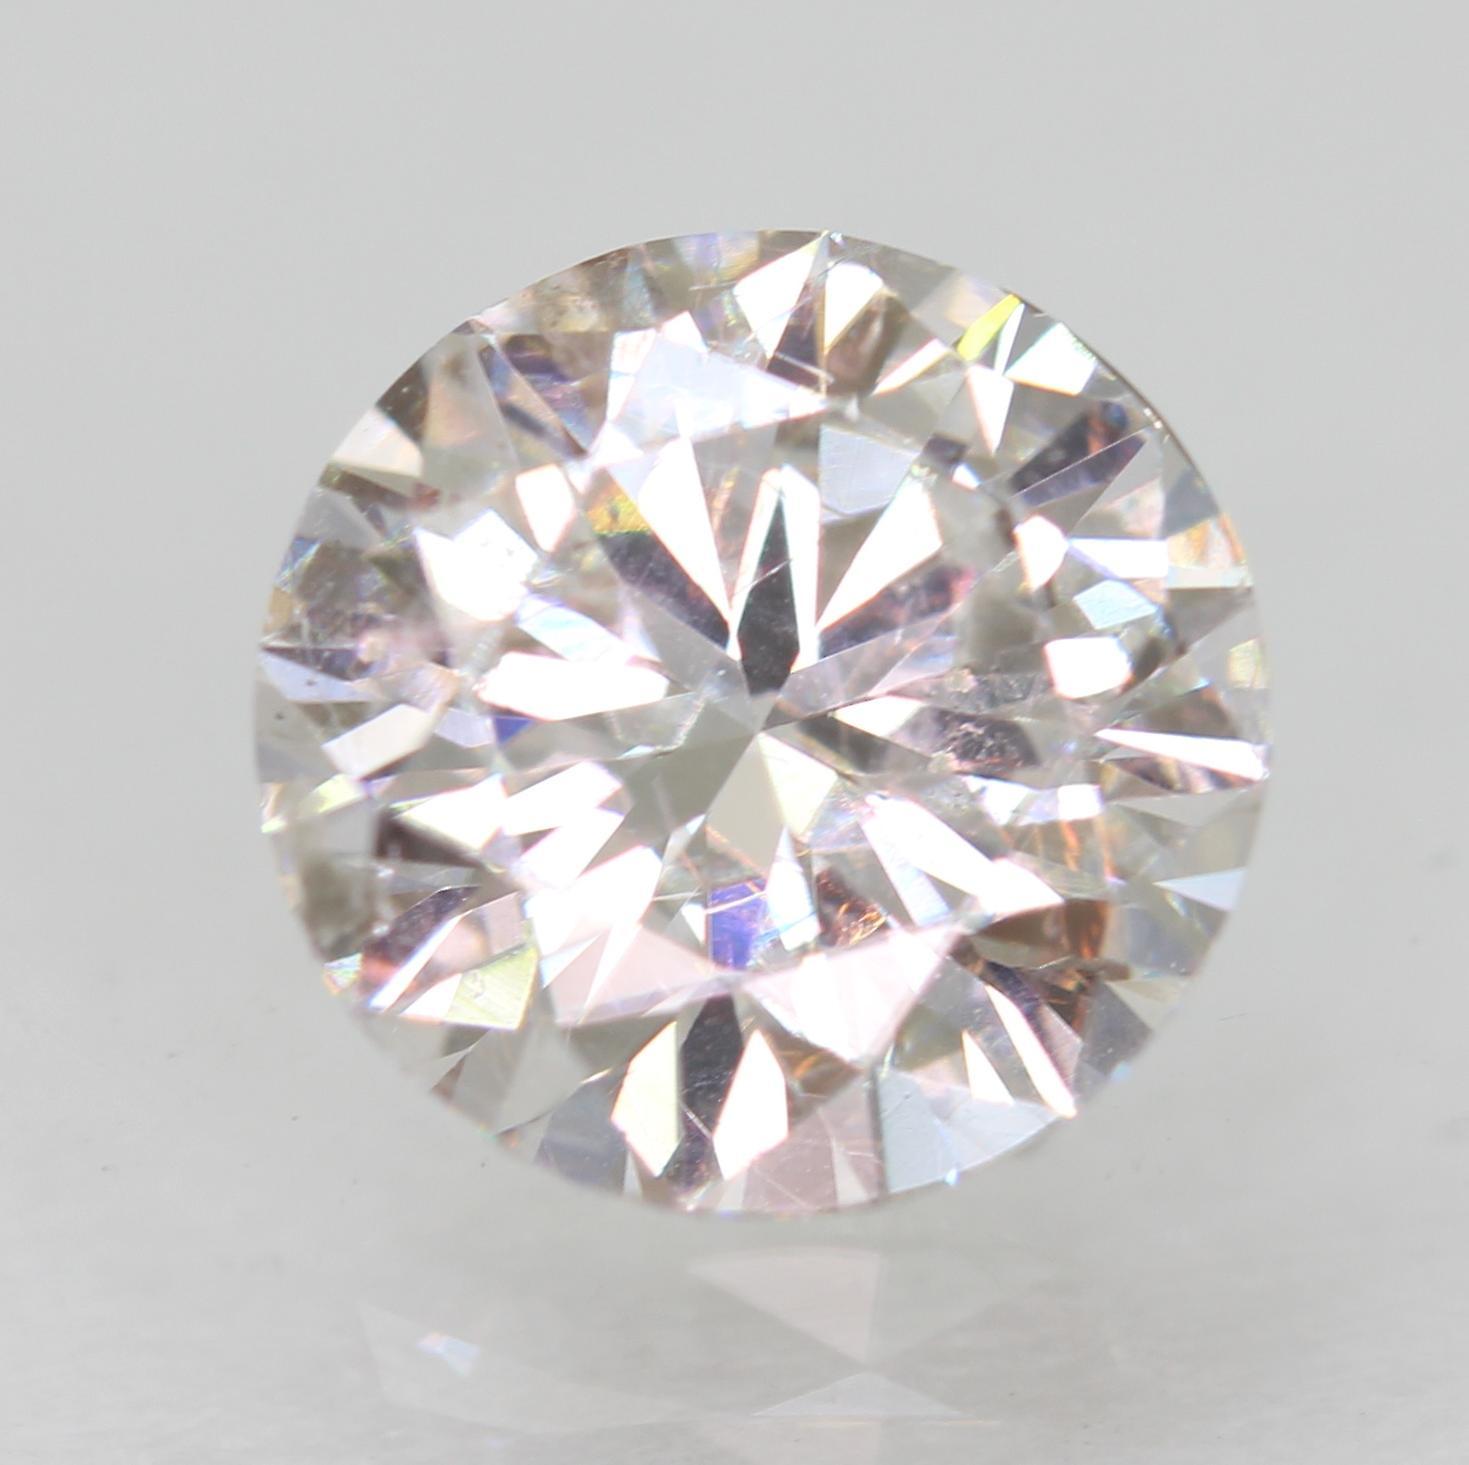 Certified 1.02 Carat G VS1 Round Brilliant Enhanced Natural Loose Diamond 6.51mm